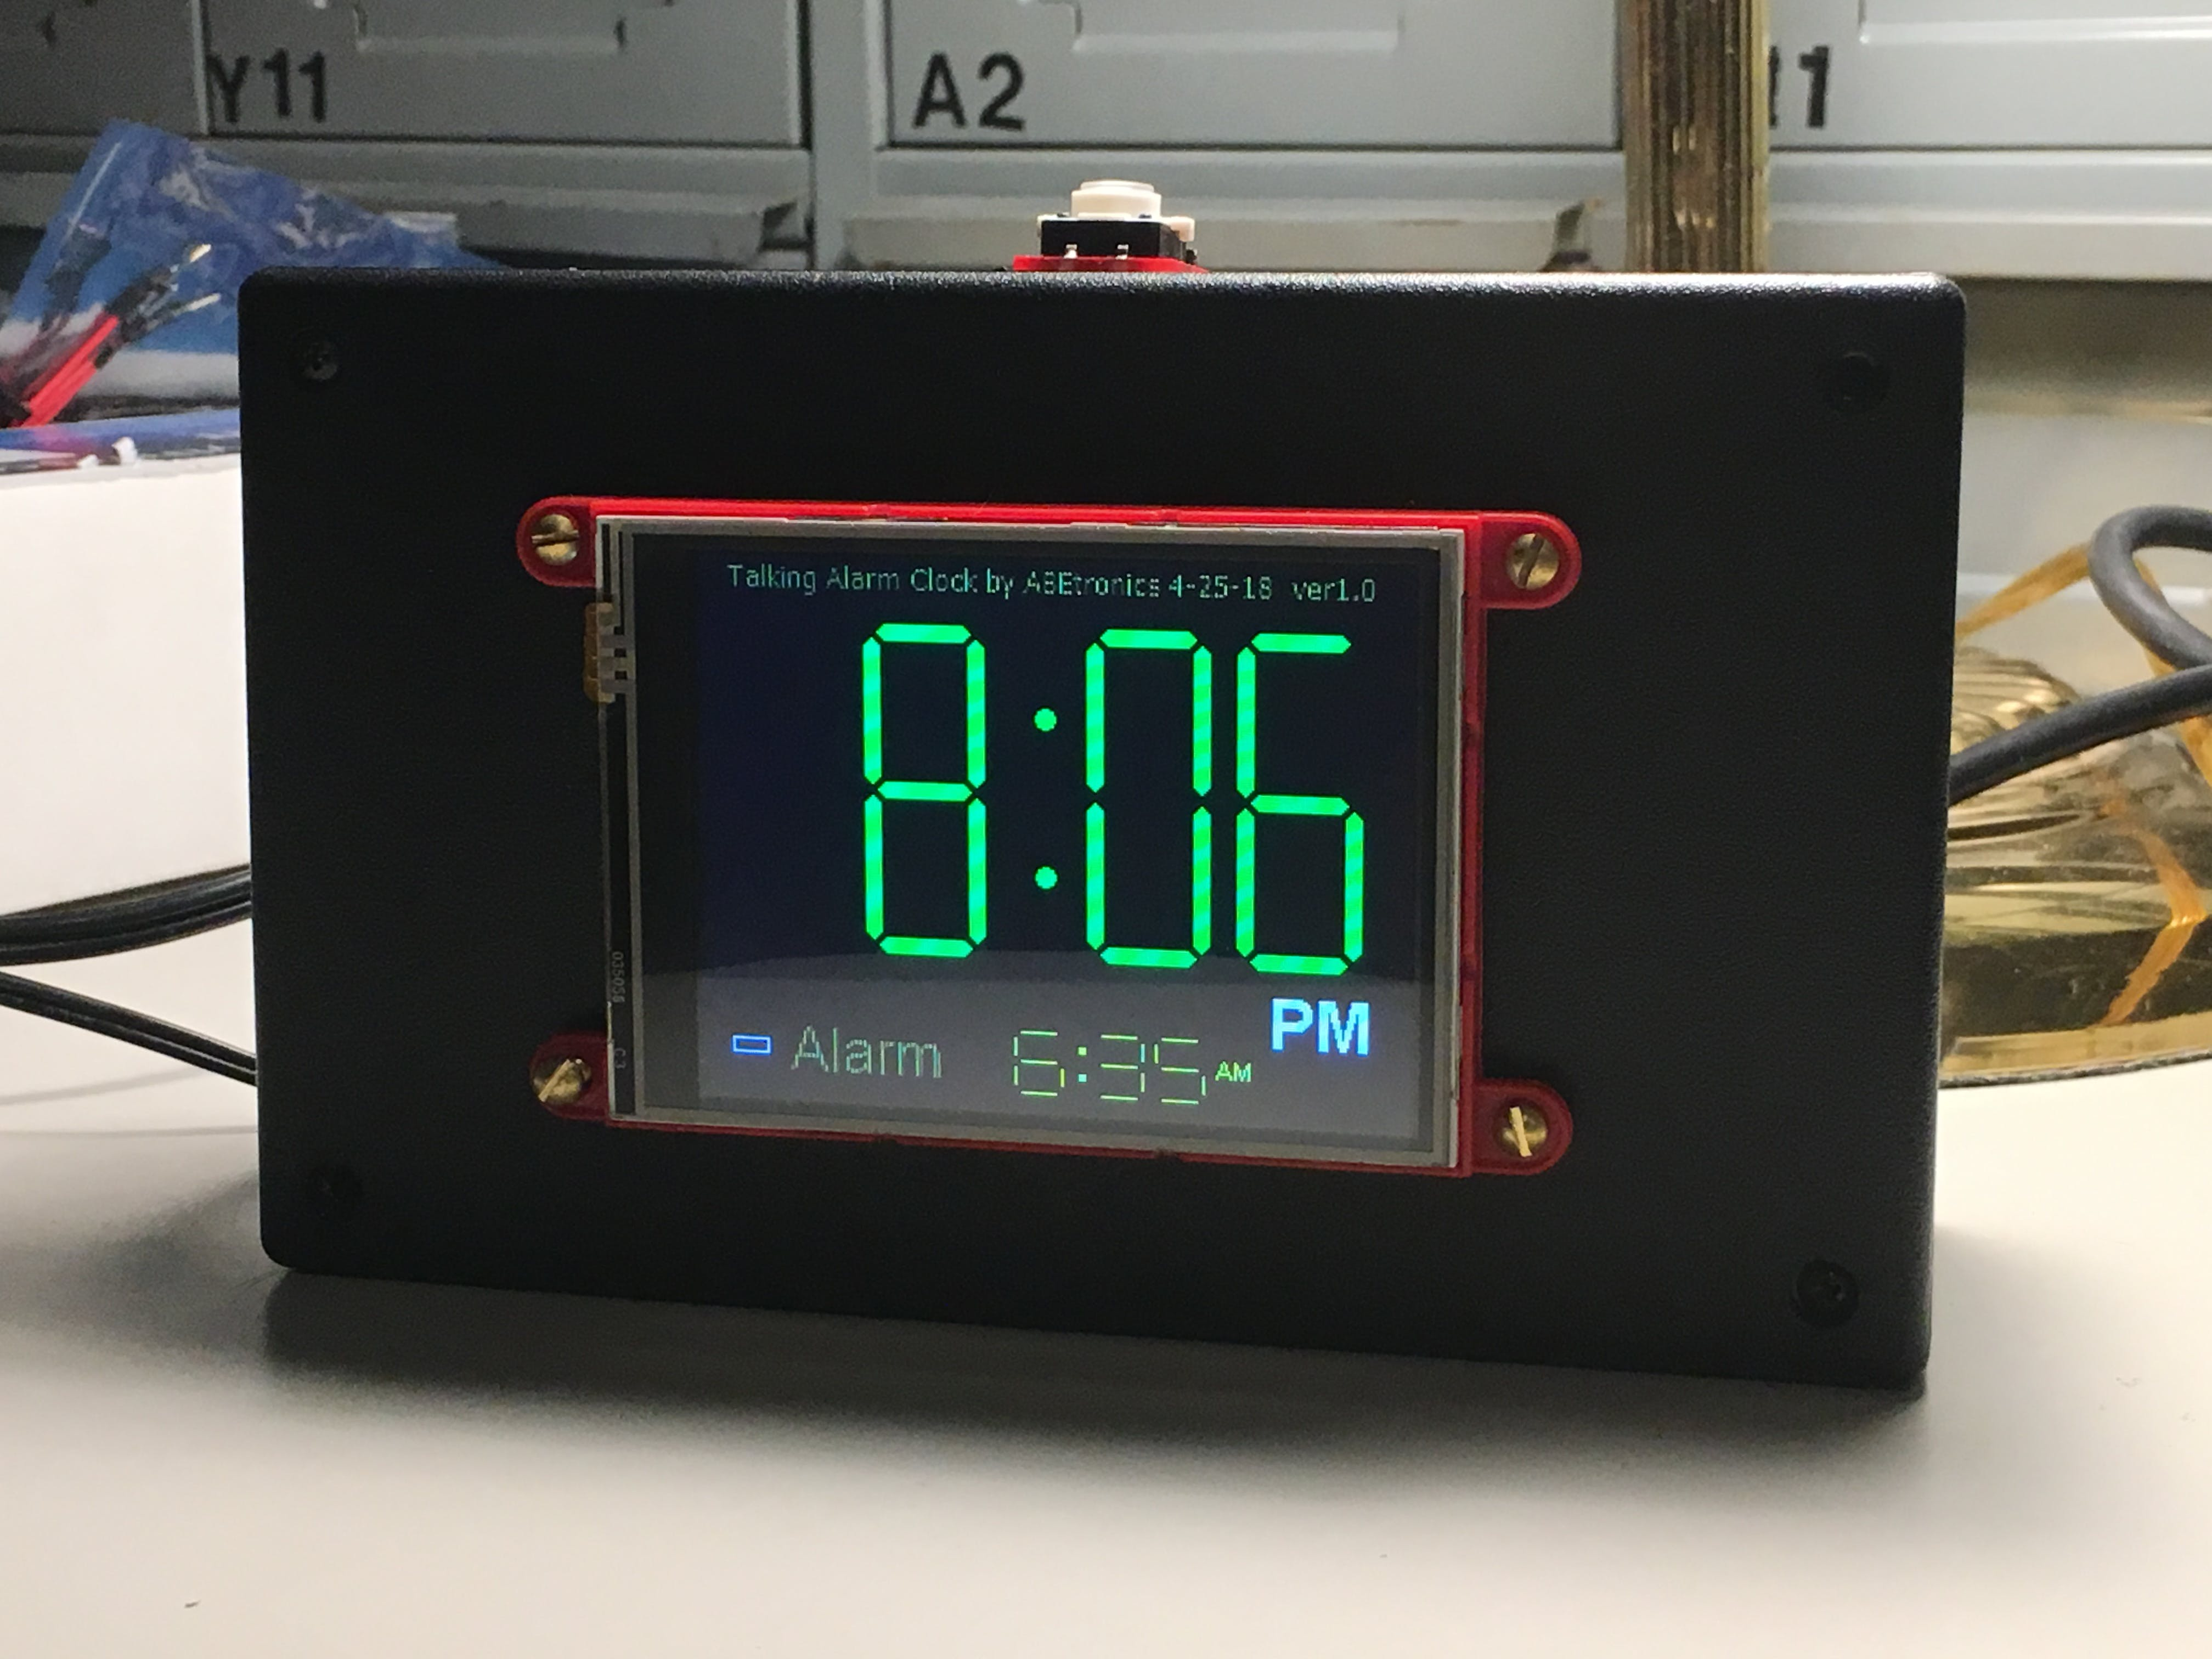 The Talking Alarm Clock